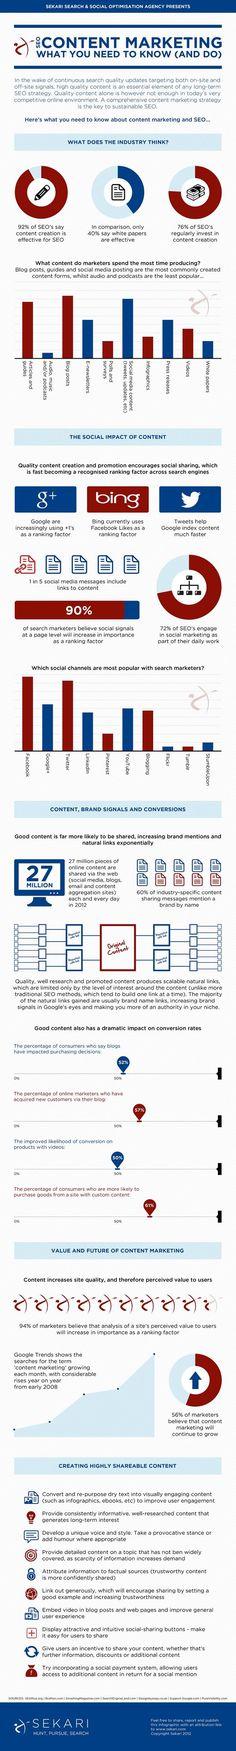 SEO IDEAS Content marketing, internet marketing, blogging, social media, website web design, online marketing, promotion, facebook, google plus, blogs, backlinks, links,brand, conversation, branding